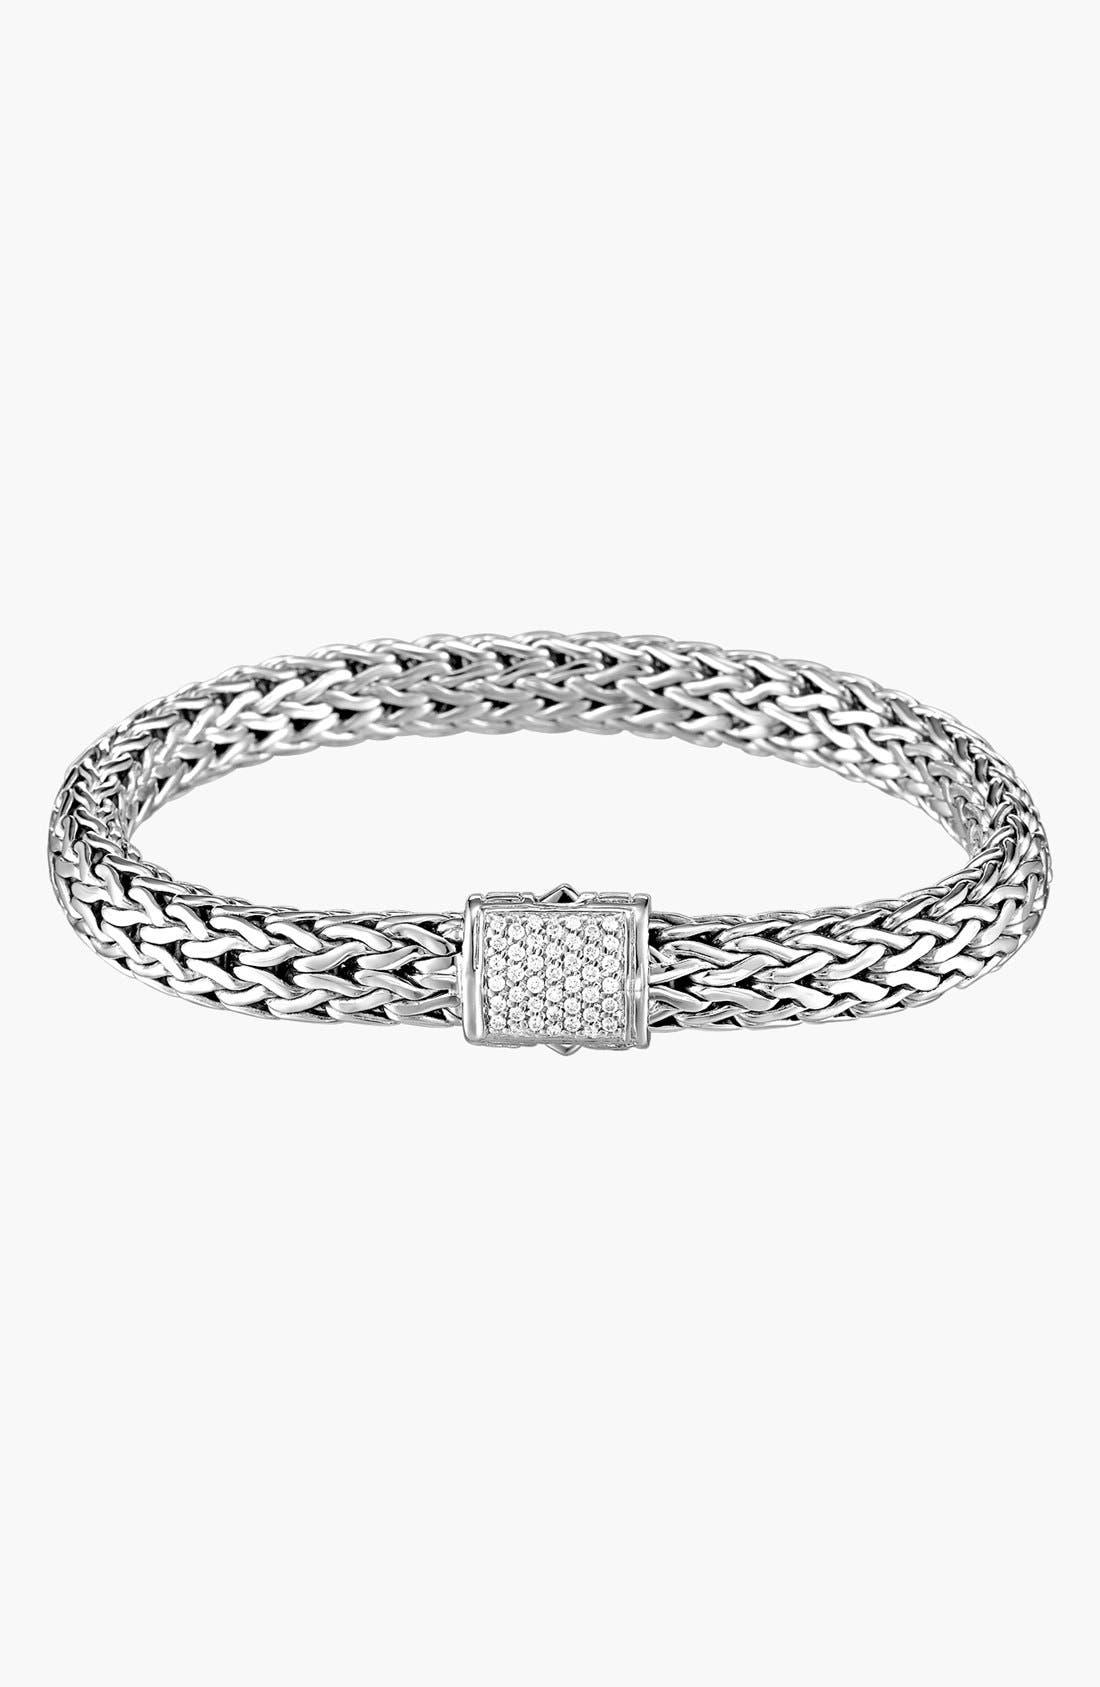 Alternate Image 1 Selected - John Hardy 'Classic Chain' Medium Pavé Diamond Bracelet